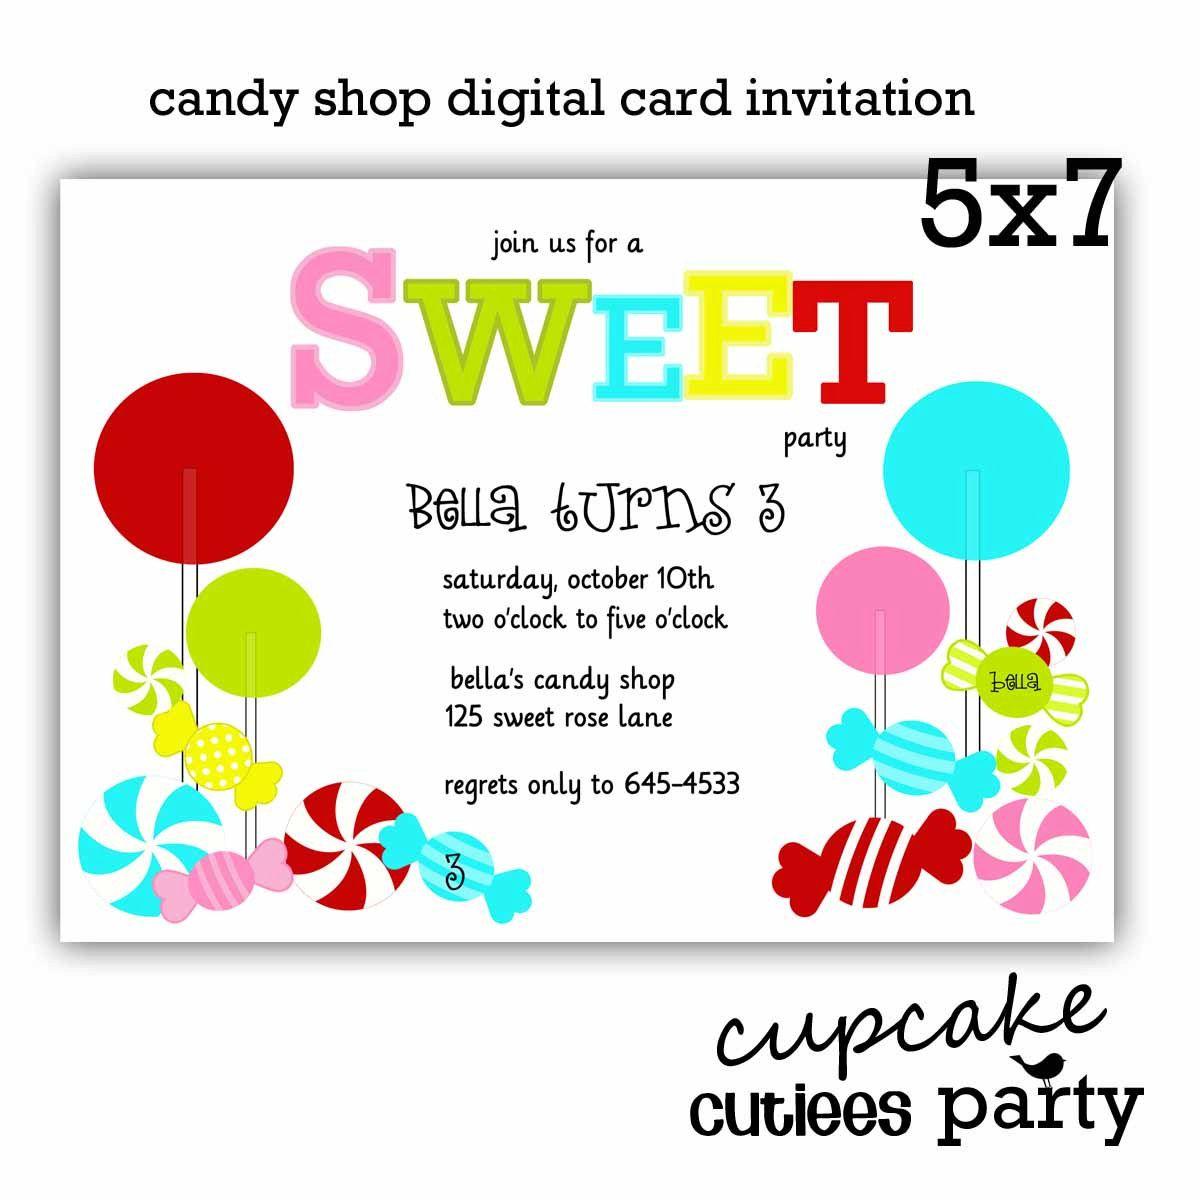 Candyland party invitation | Stuff to Buy | Pinterest | Candyland ...